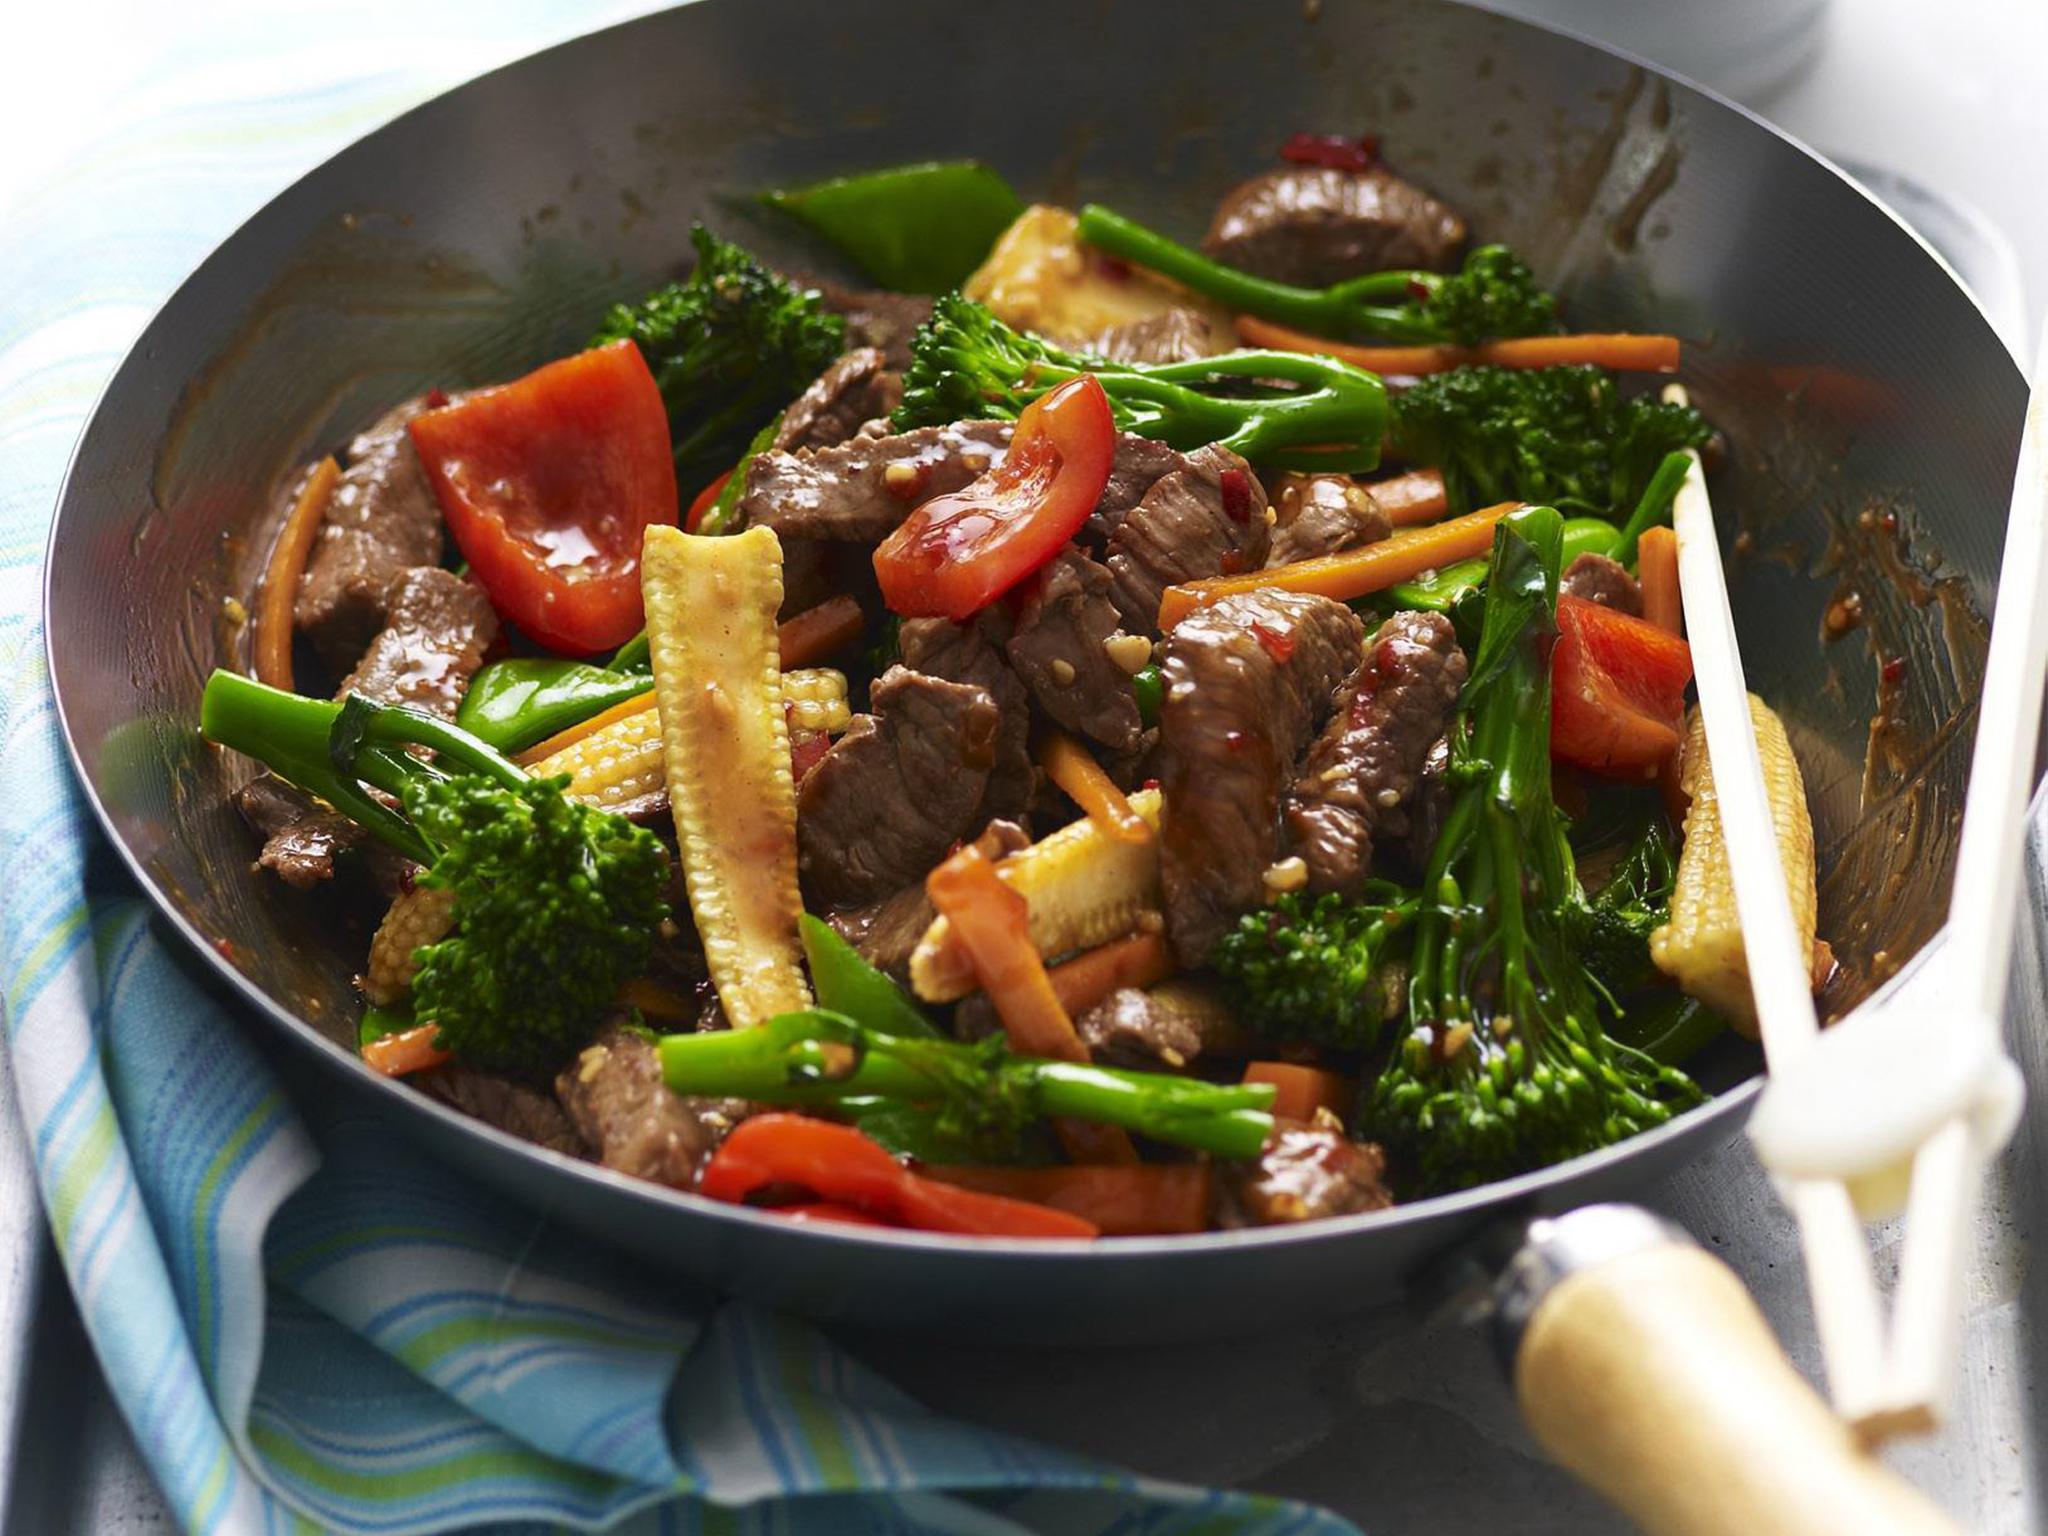 Garlic Beef and Vegetable Stir Fry